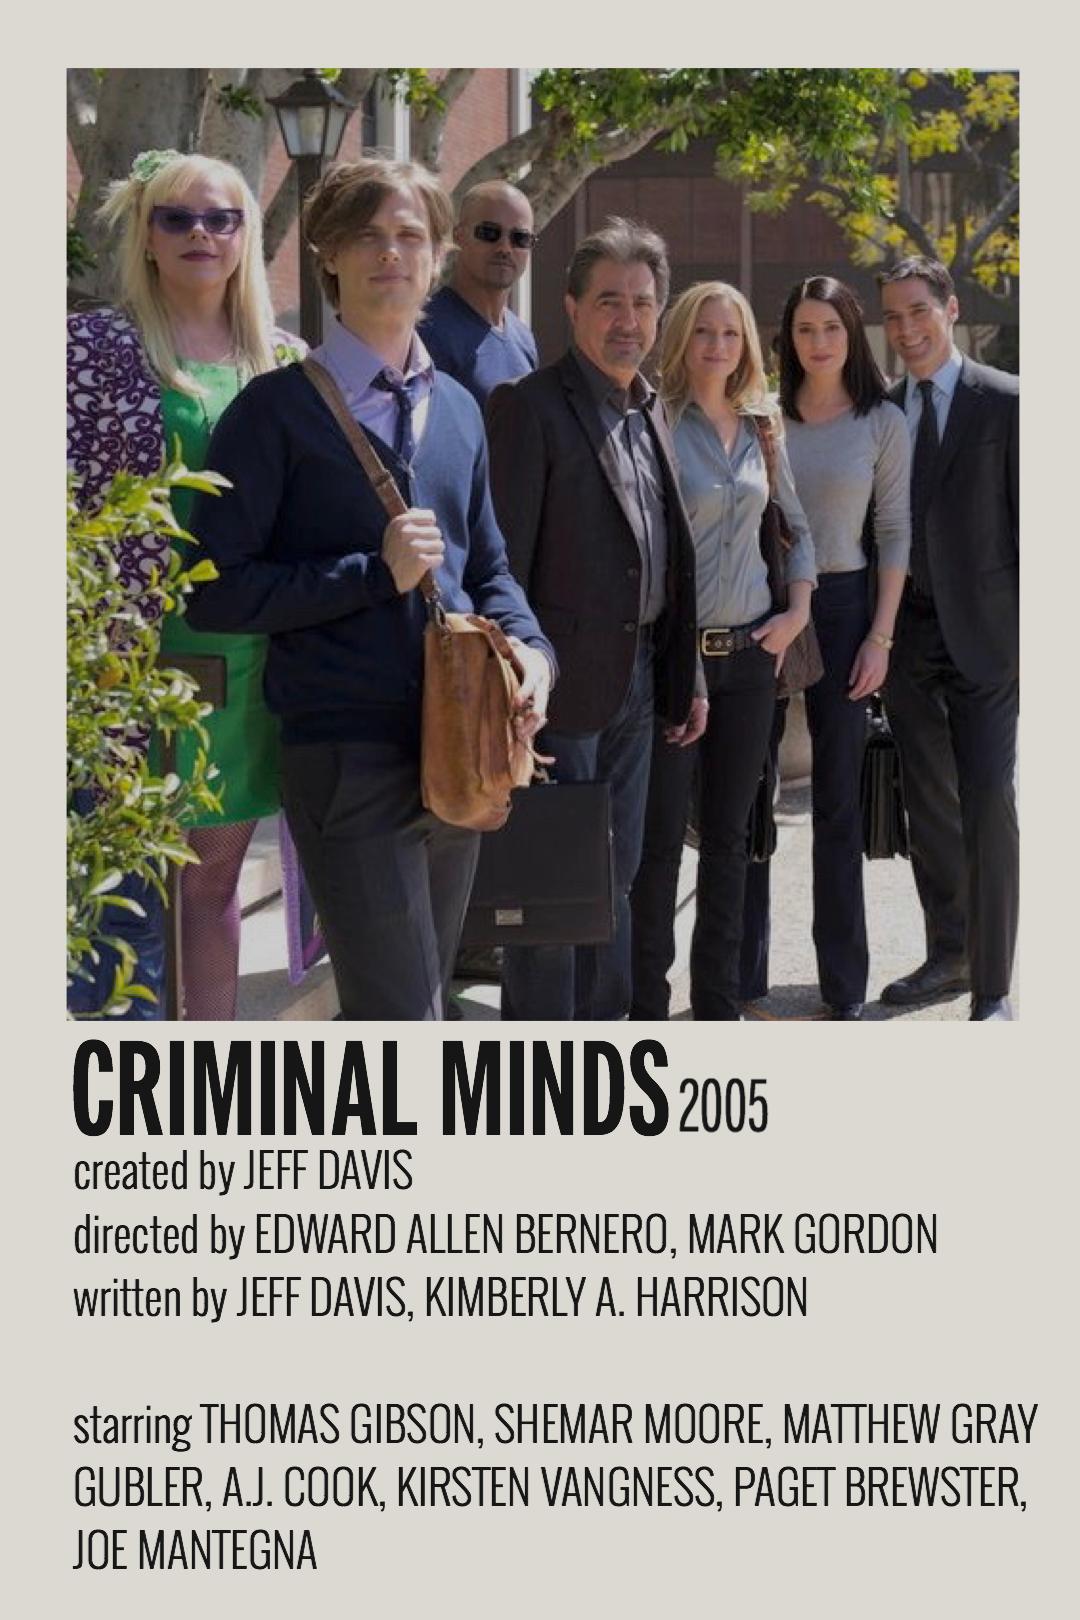 criminal minds poster indie movie